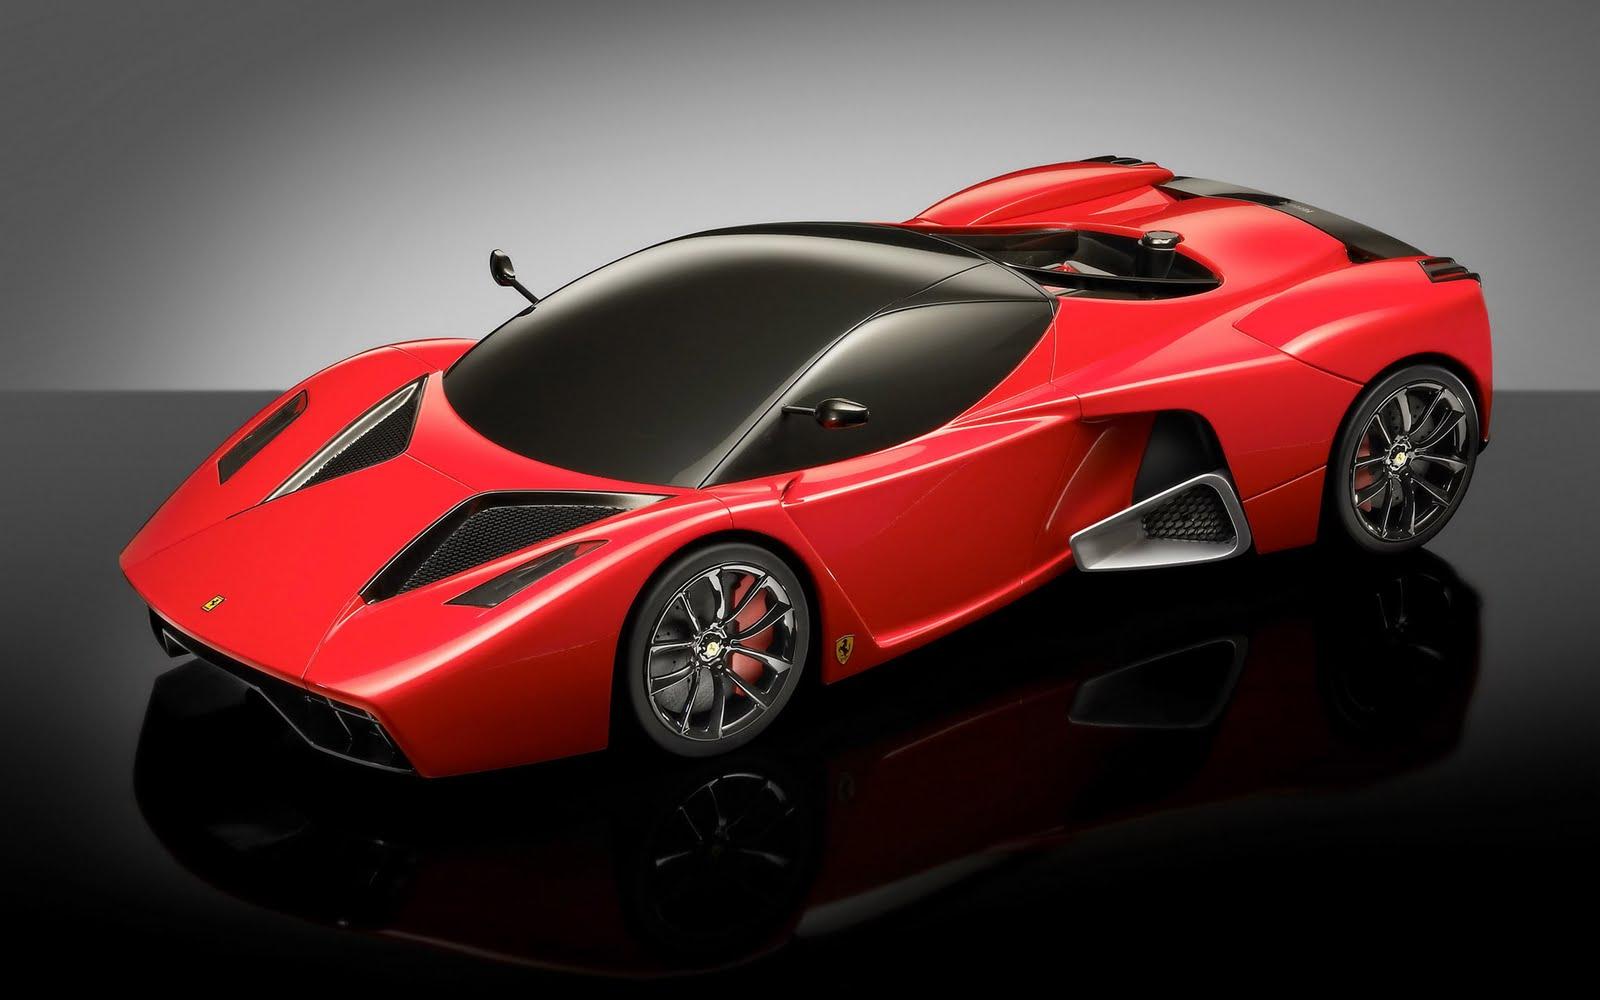 http://2.bp.blogspot.com/_Y5VHIIGTJ1c/TCC9MGqf83I/AAAAAAAANJ8/cSoB1DKKUYY/s1600/Ferrari+(45)-799523.jpg